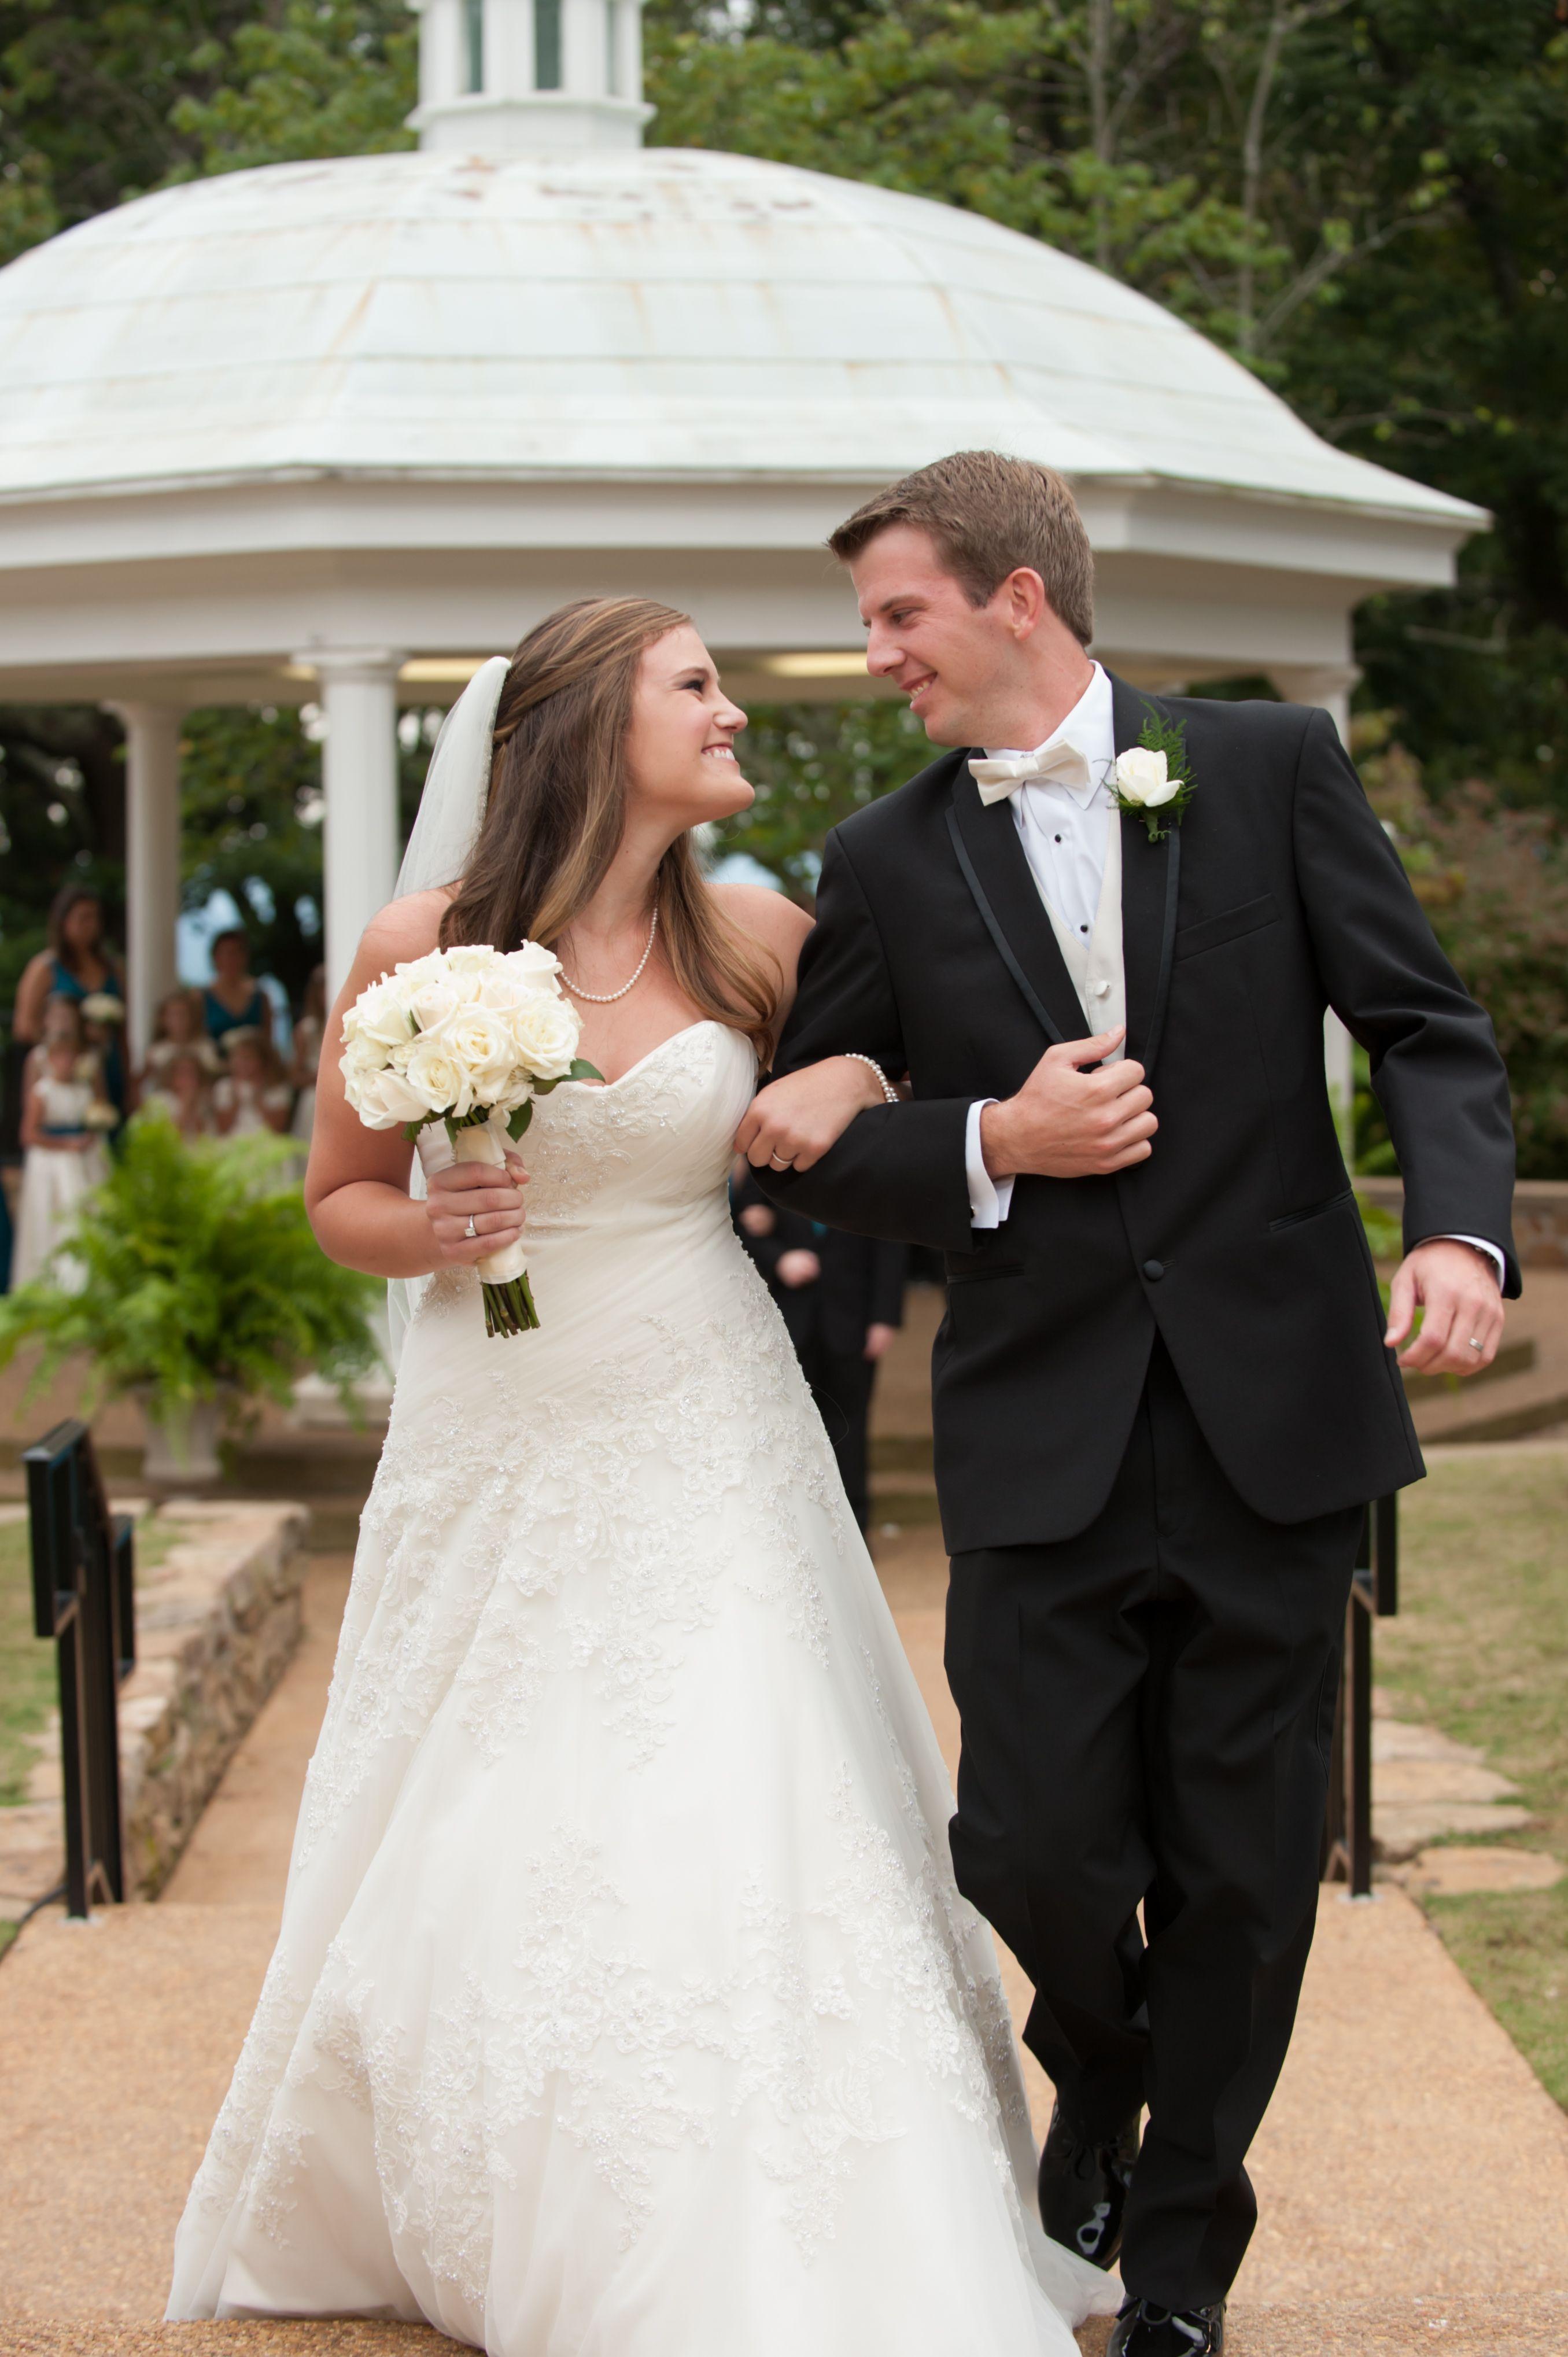 Wedding dress huntsville al  wedding photography wedding images bride and groom ndyshaver